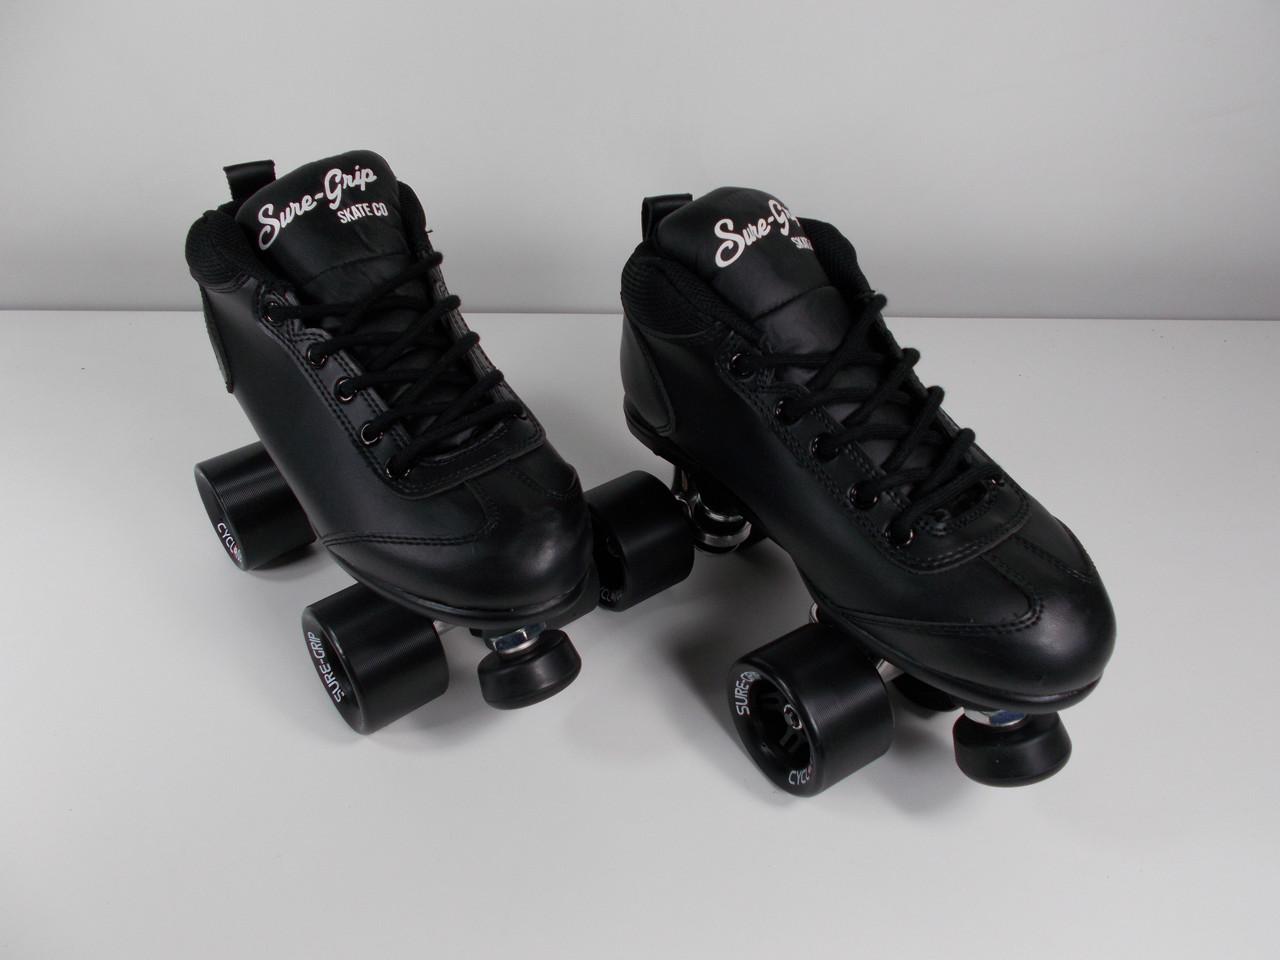 Roller Skates On Sales Rollerskatenation Com >> Slightly Used Sure Grip Cyclone Roller Skate Size 6